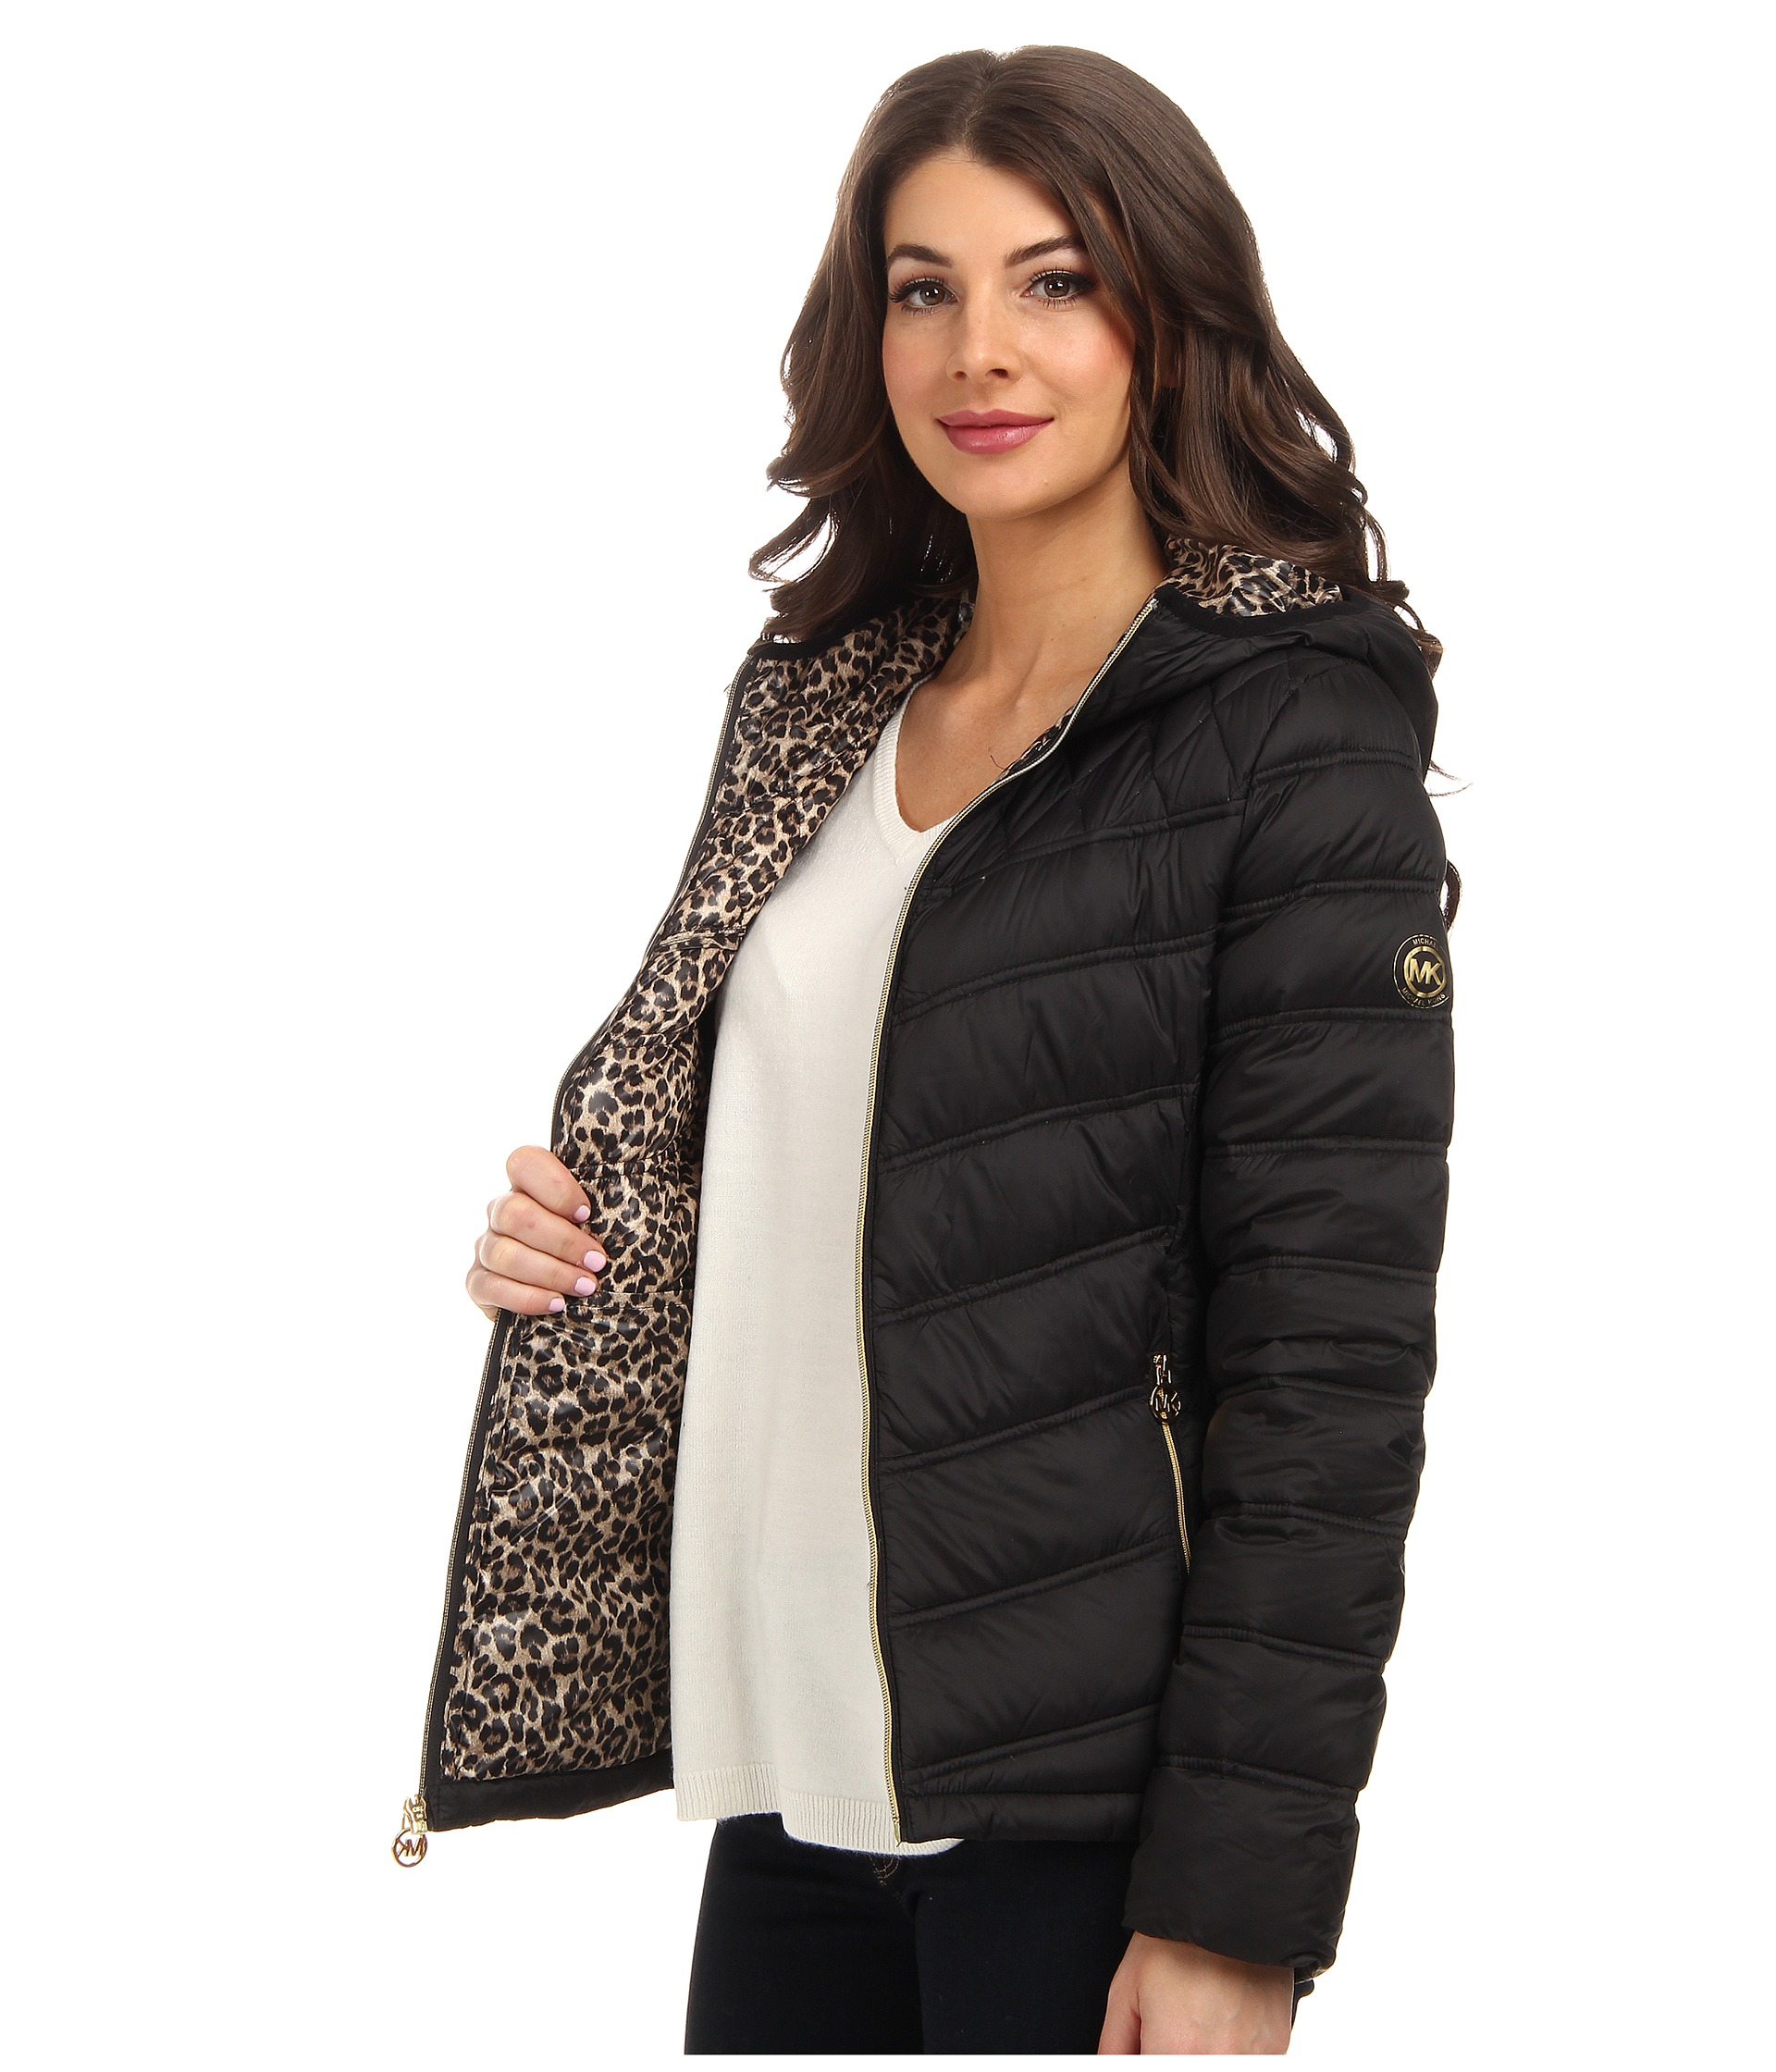 7a2a4853ebd4 MICHAEL Michael Kors Short Packable Contrast Zipper Jacket in Black ...